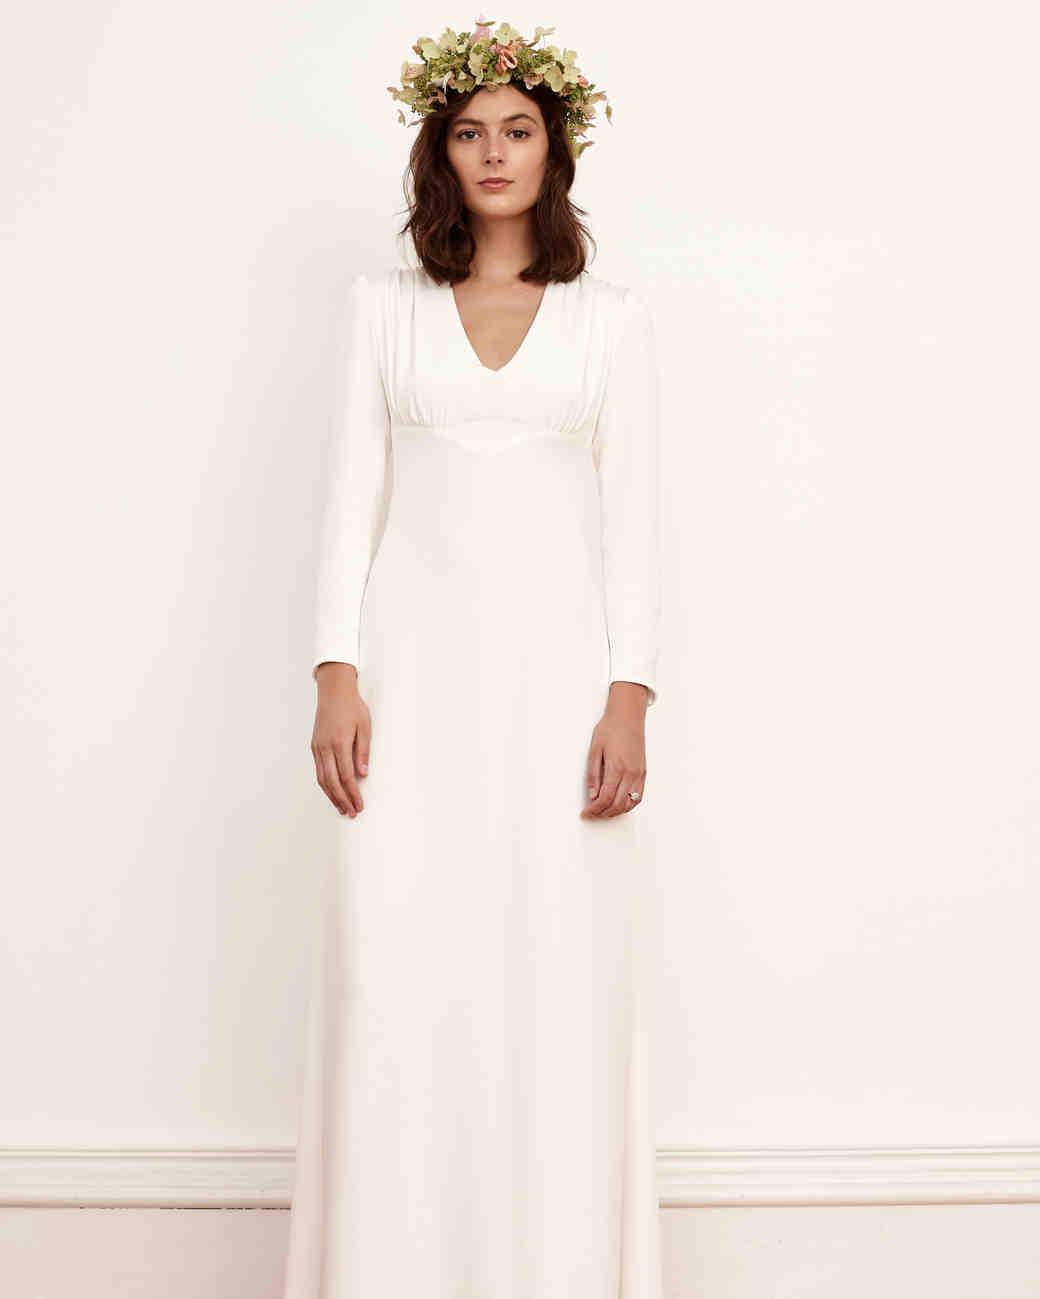 Pnina Tornai Ball Gown Wedding Dresses 77 Cute Savannah Miller Fall Wedding